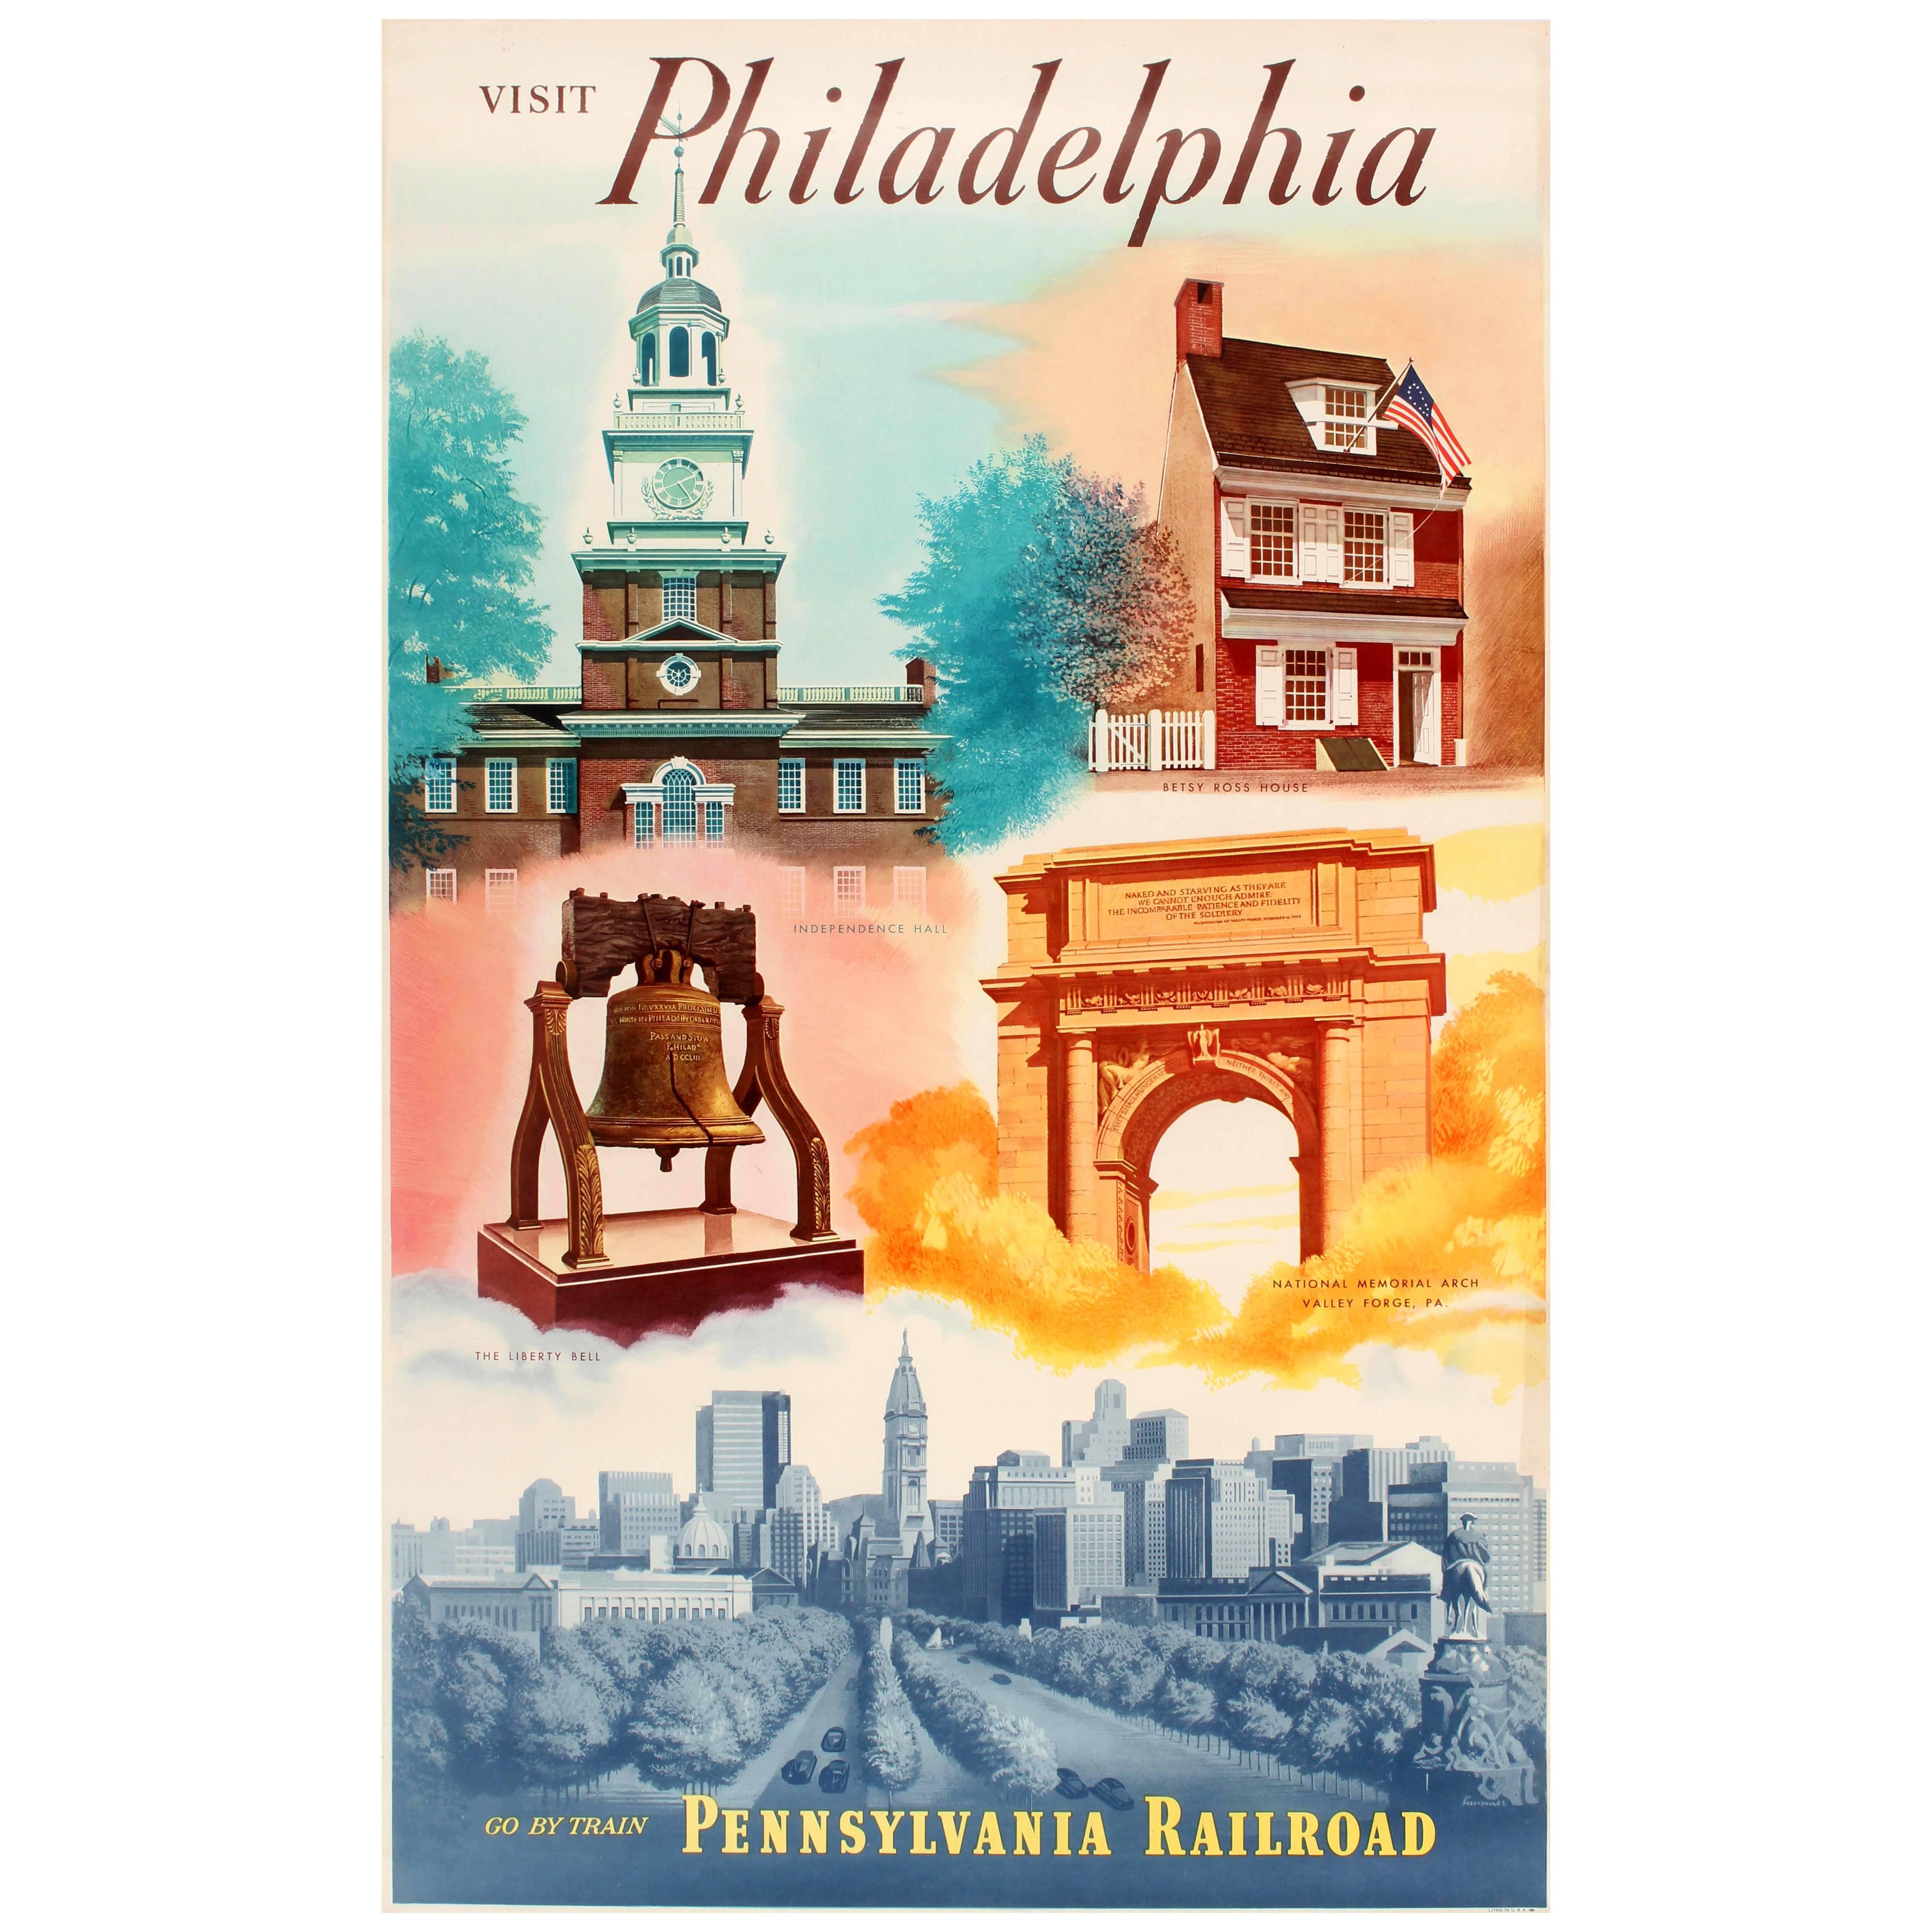 Original Vintage Pennsylvania Railroad Poster Visit Philadelphia Go by Train